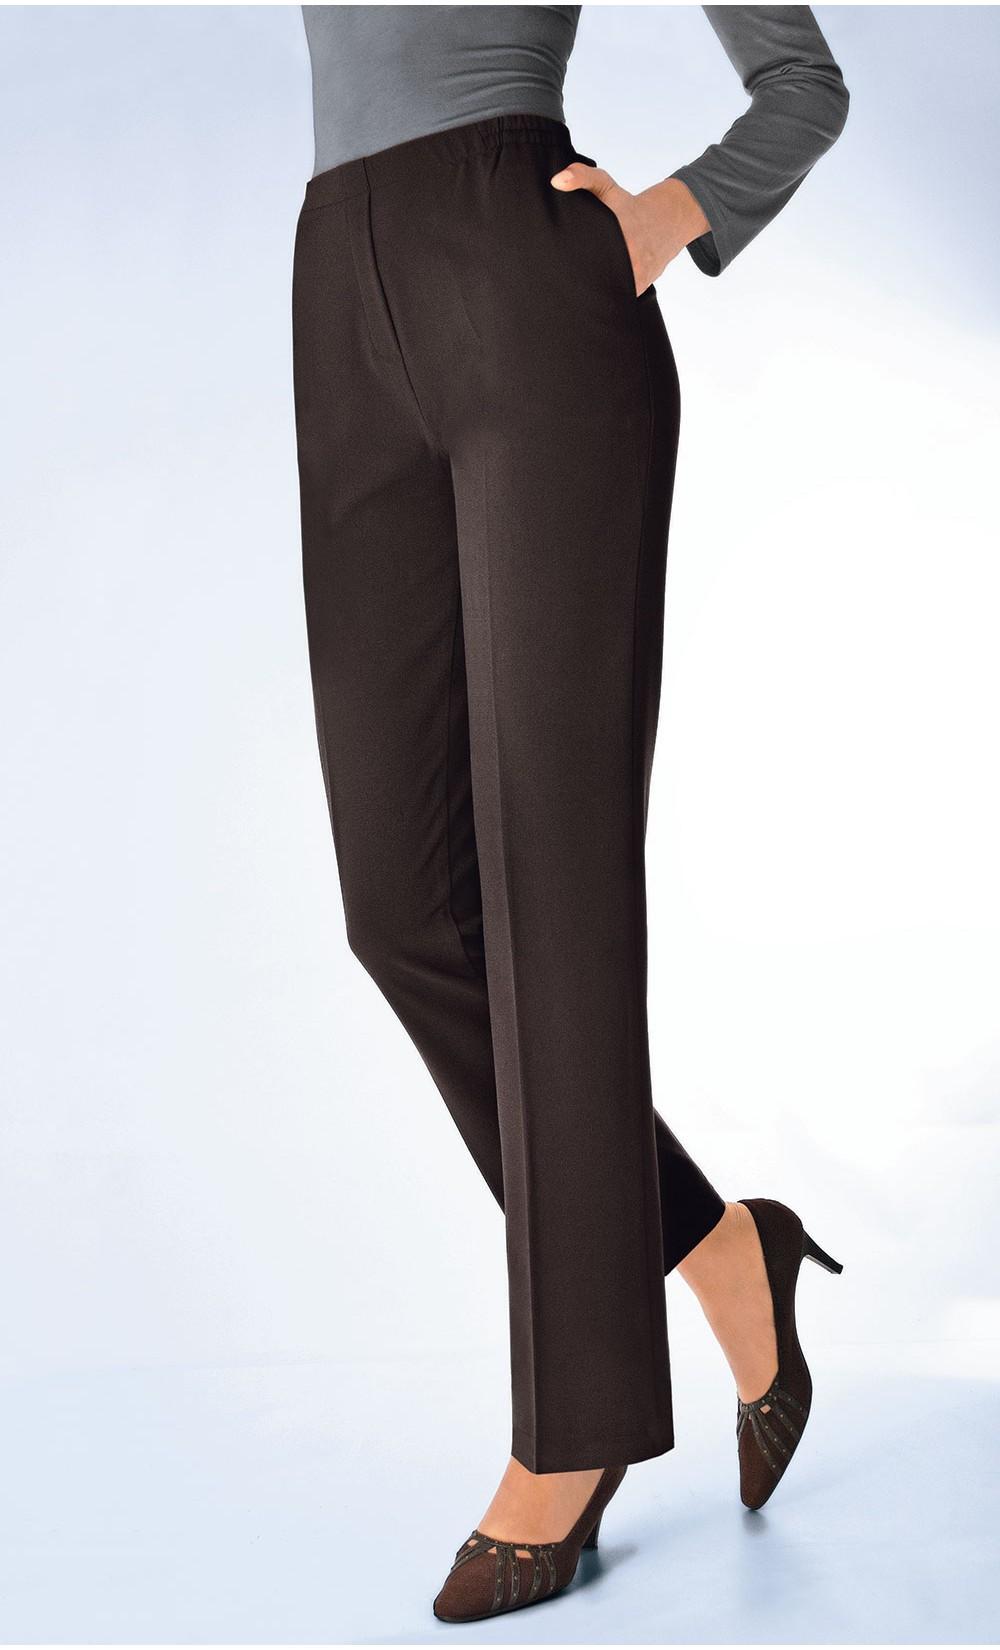 pantalon - NODALE